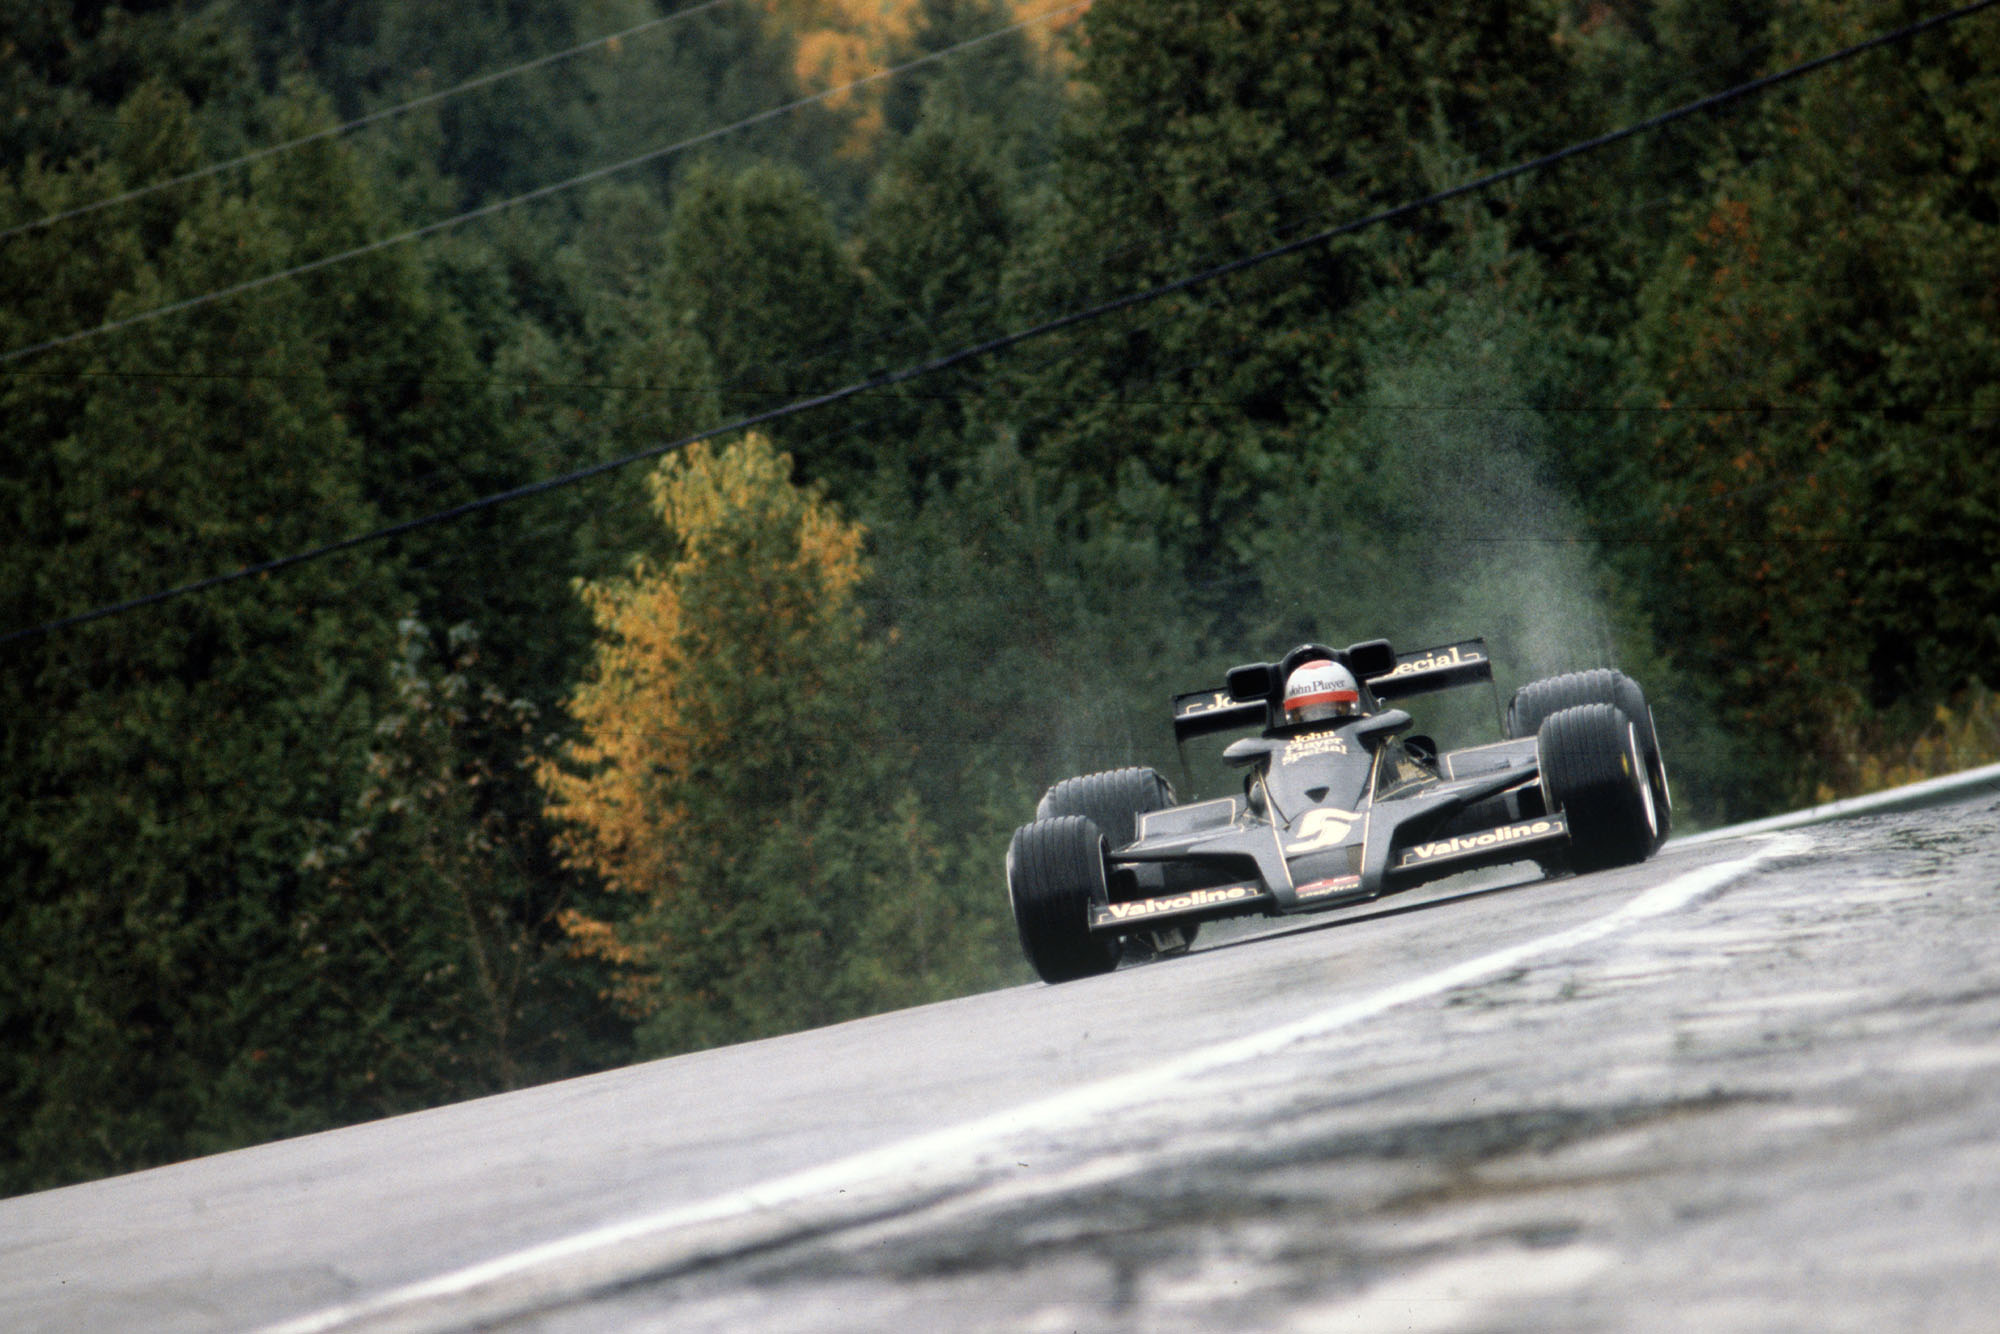 Mario Andretti (Lotus) at the 1977 Canadian Grand Prix, Mosport Park.